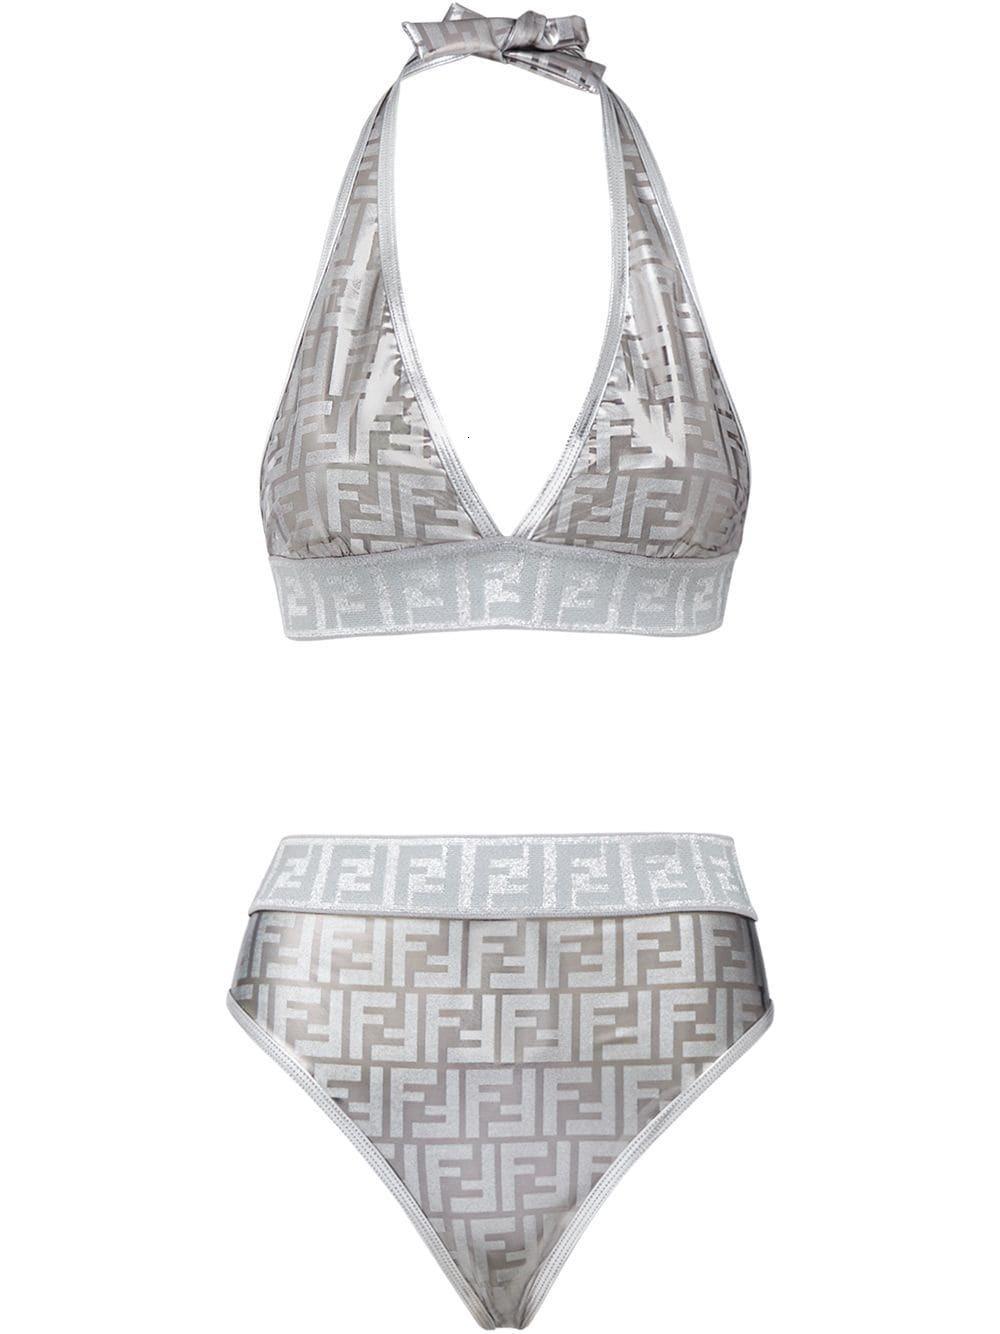 2020 high quality ladies swimwear summer fashion sexy glamour beach swimming beautiful ladies swimwear O1XP